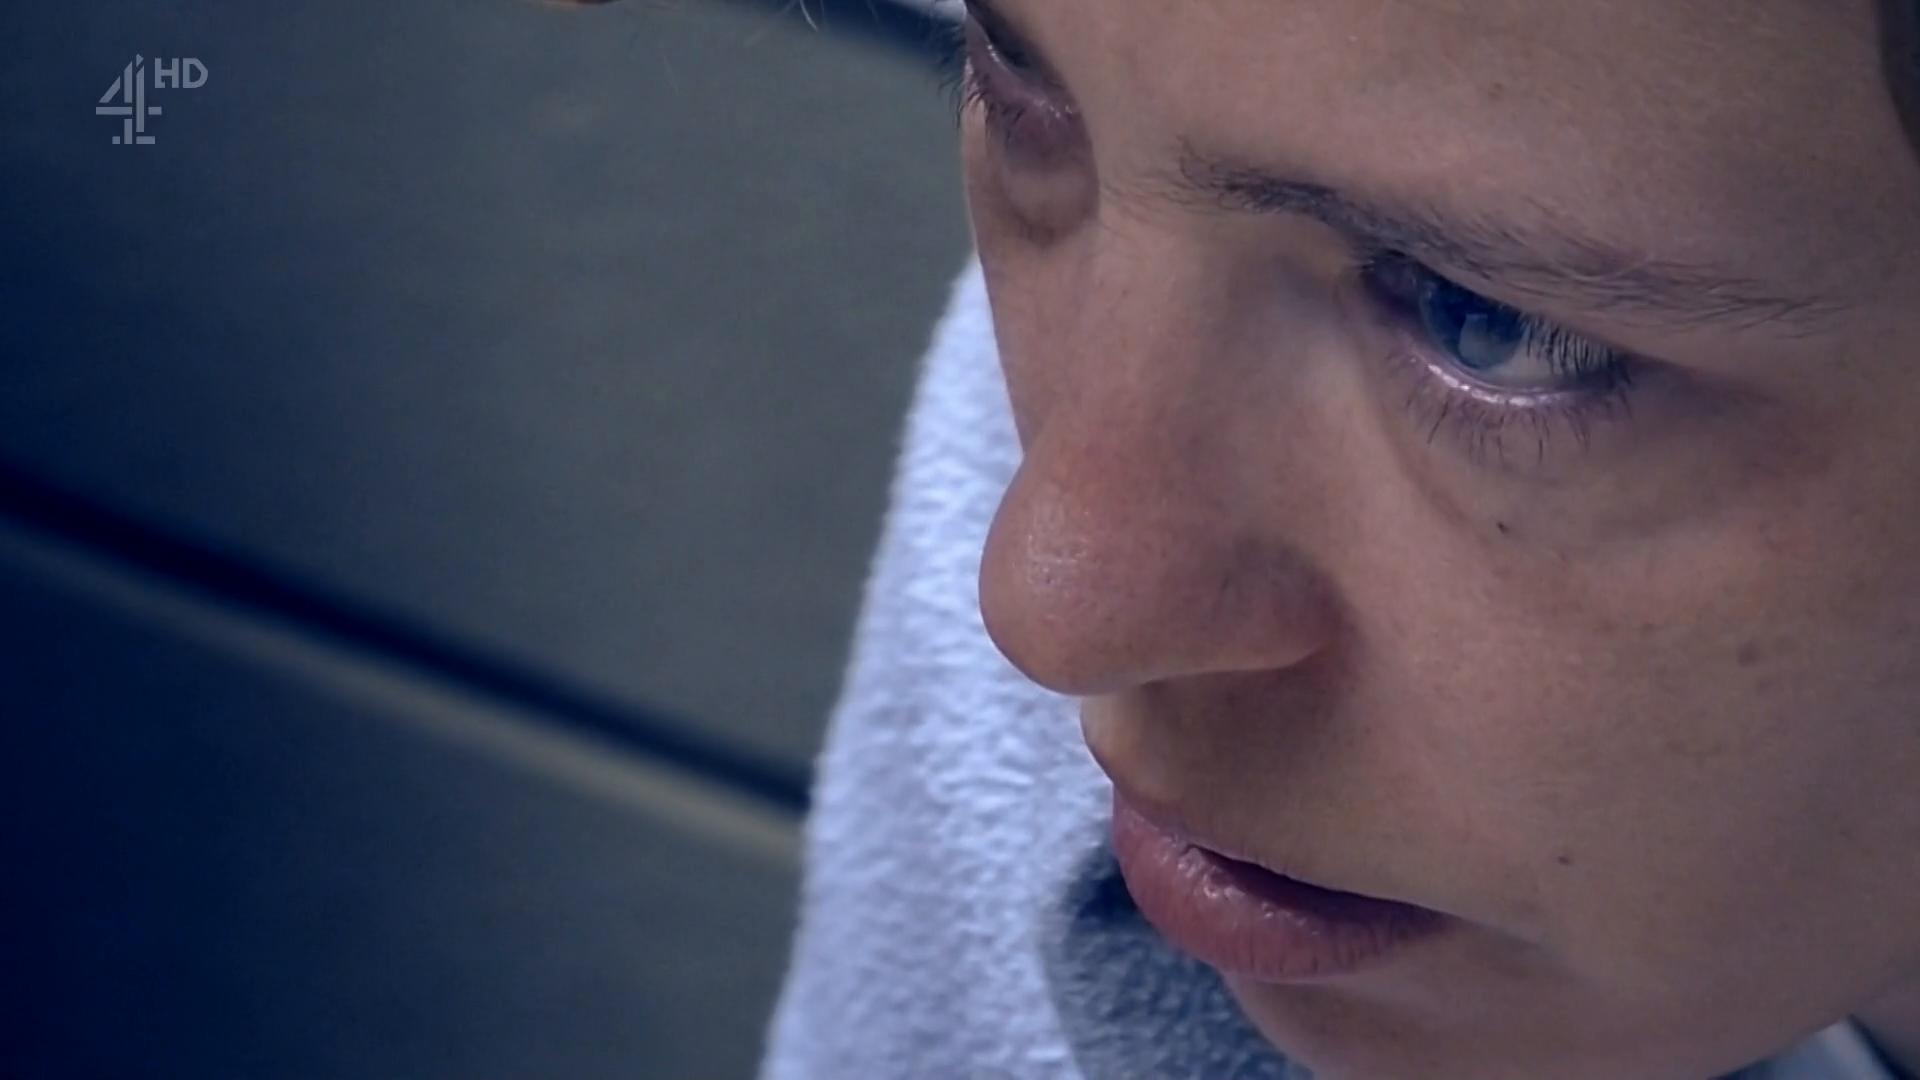 24 Hours In Police Custody S07E06 What Lies Beneath 1080p HDTV x264-PLUTONiUM